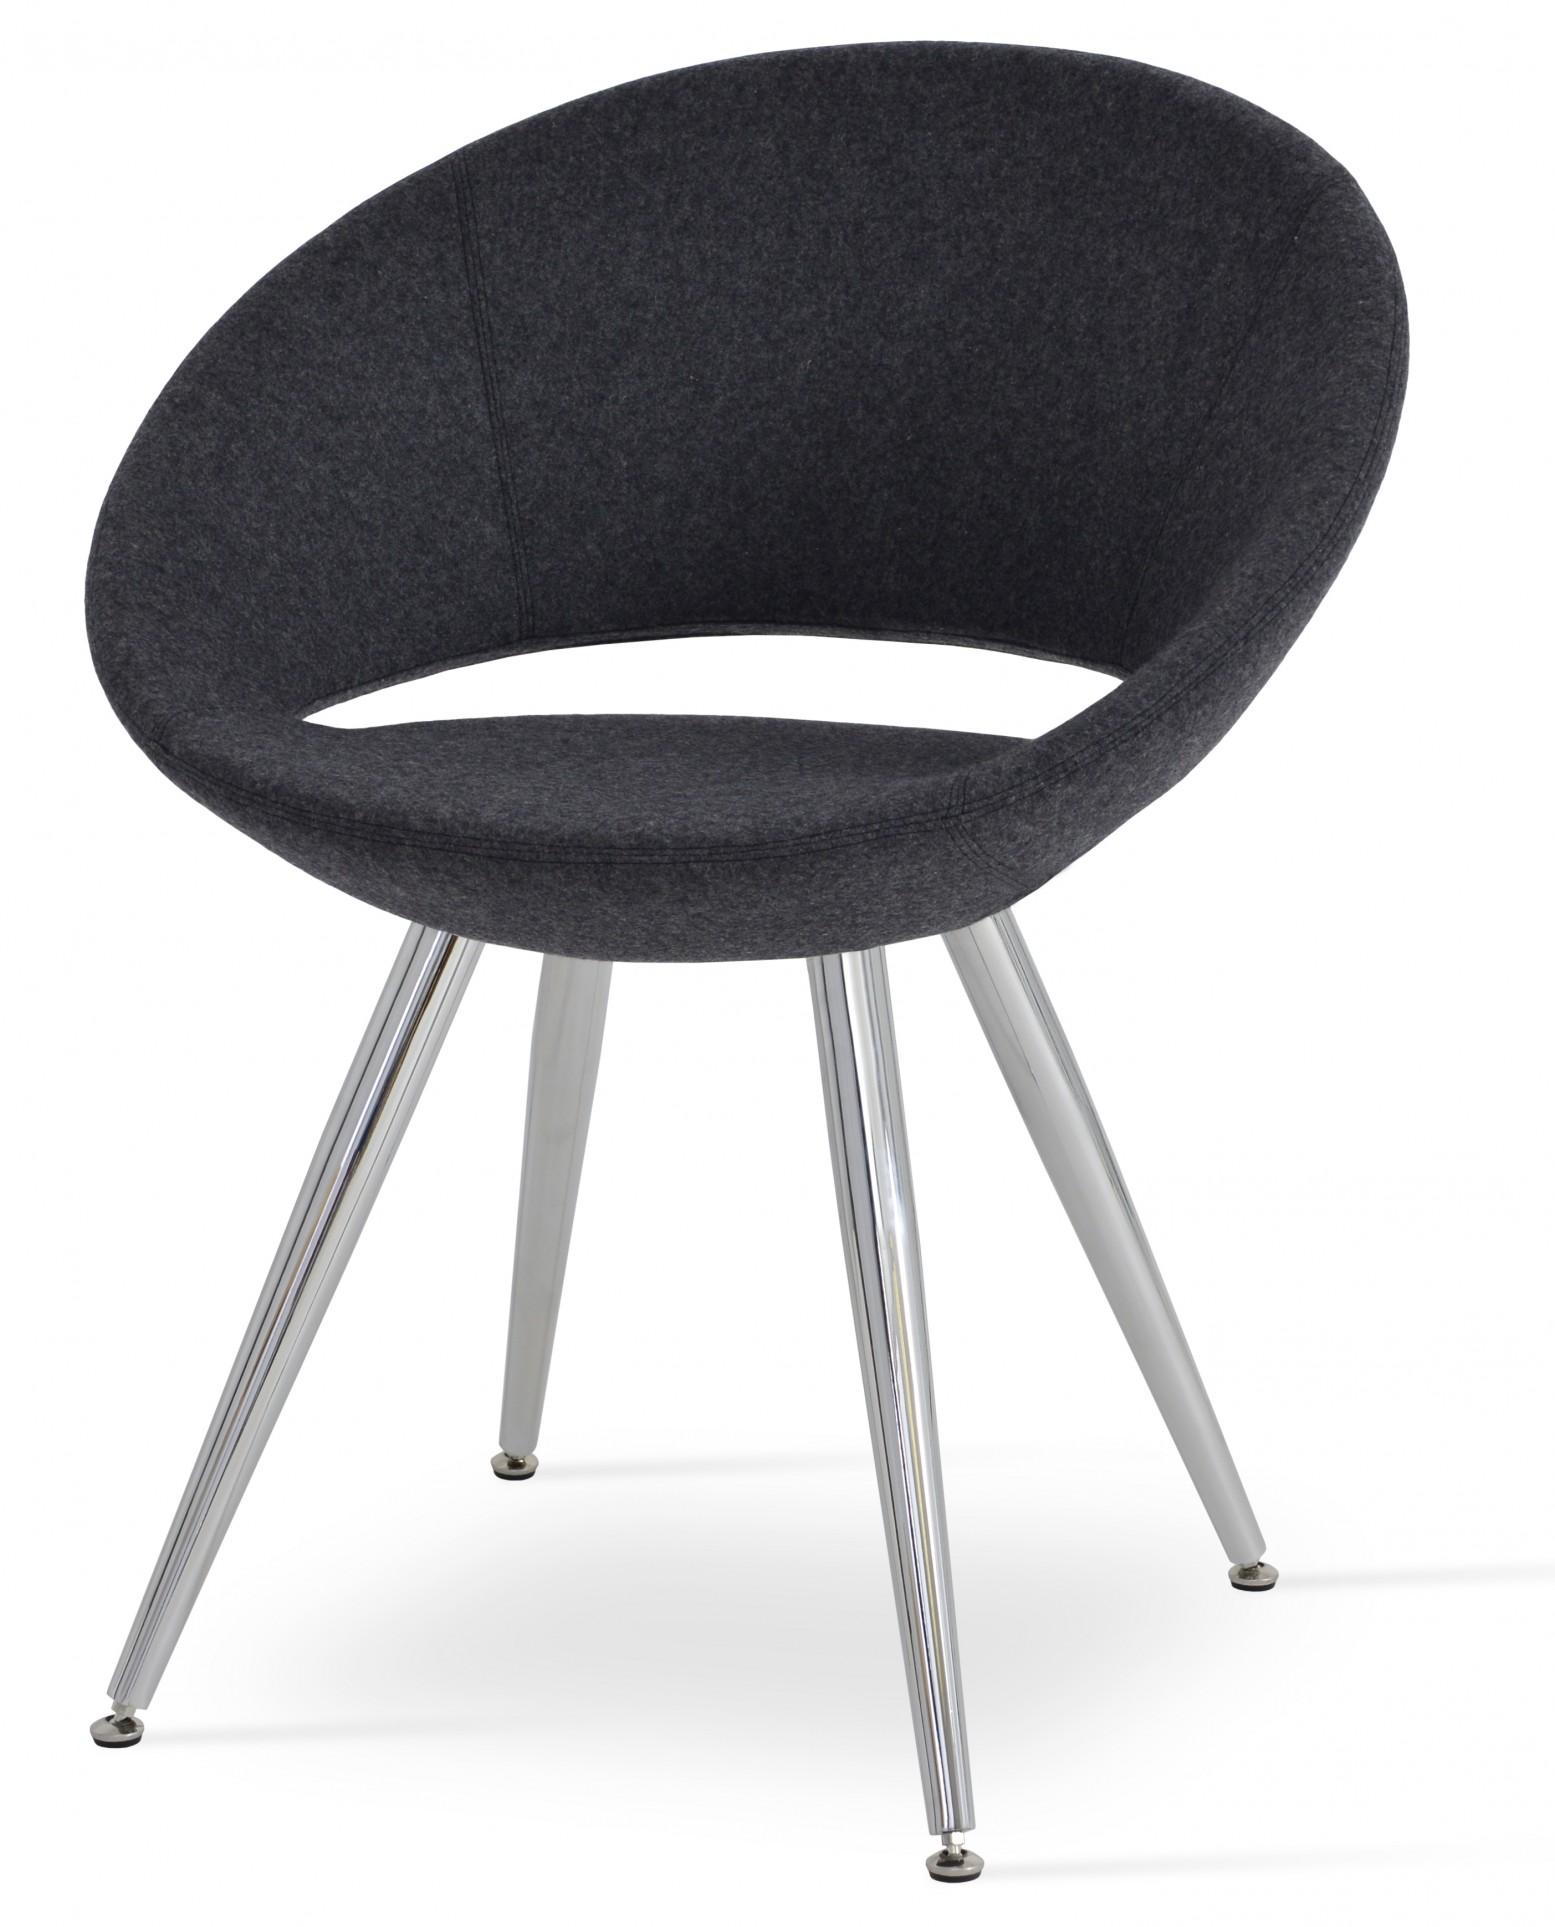 Surprising Crescent Star Chair Stainless Steel Dark Grey Camira Wool Adjustable Foot Caps Large Seat Short Links Chair Design For Home Short Linksinfo